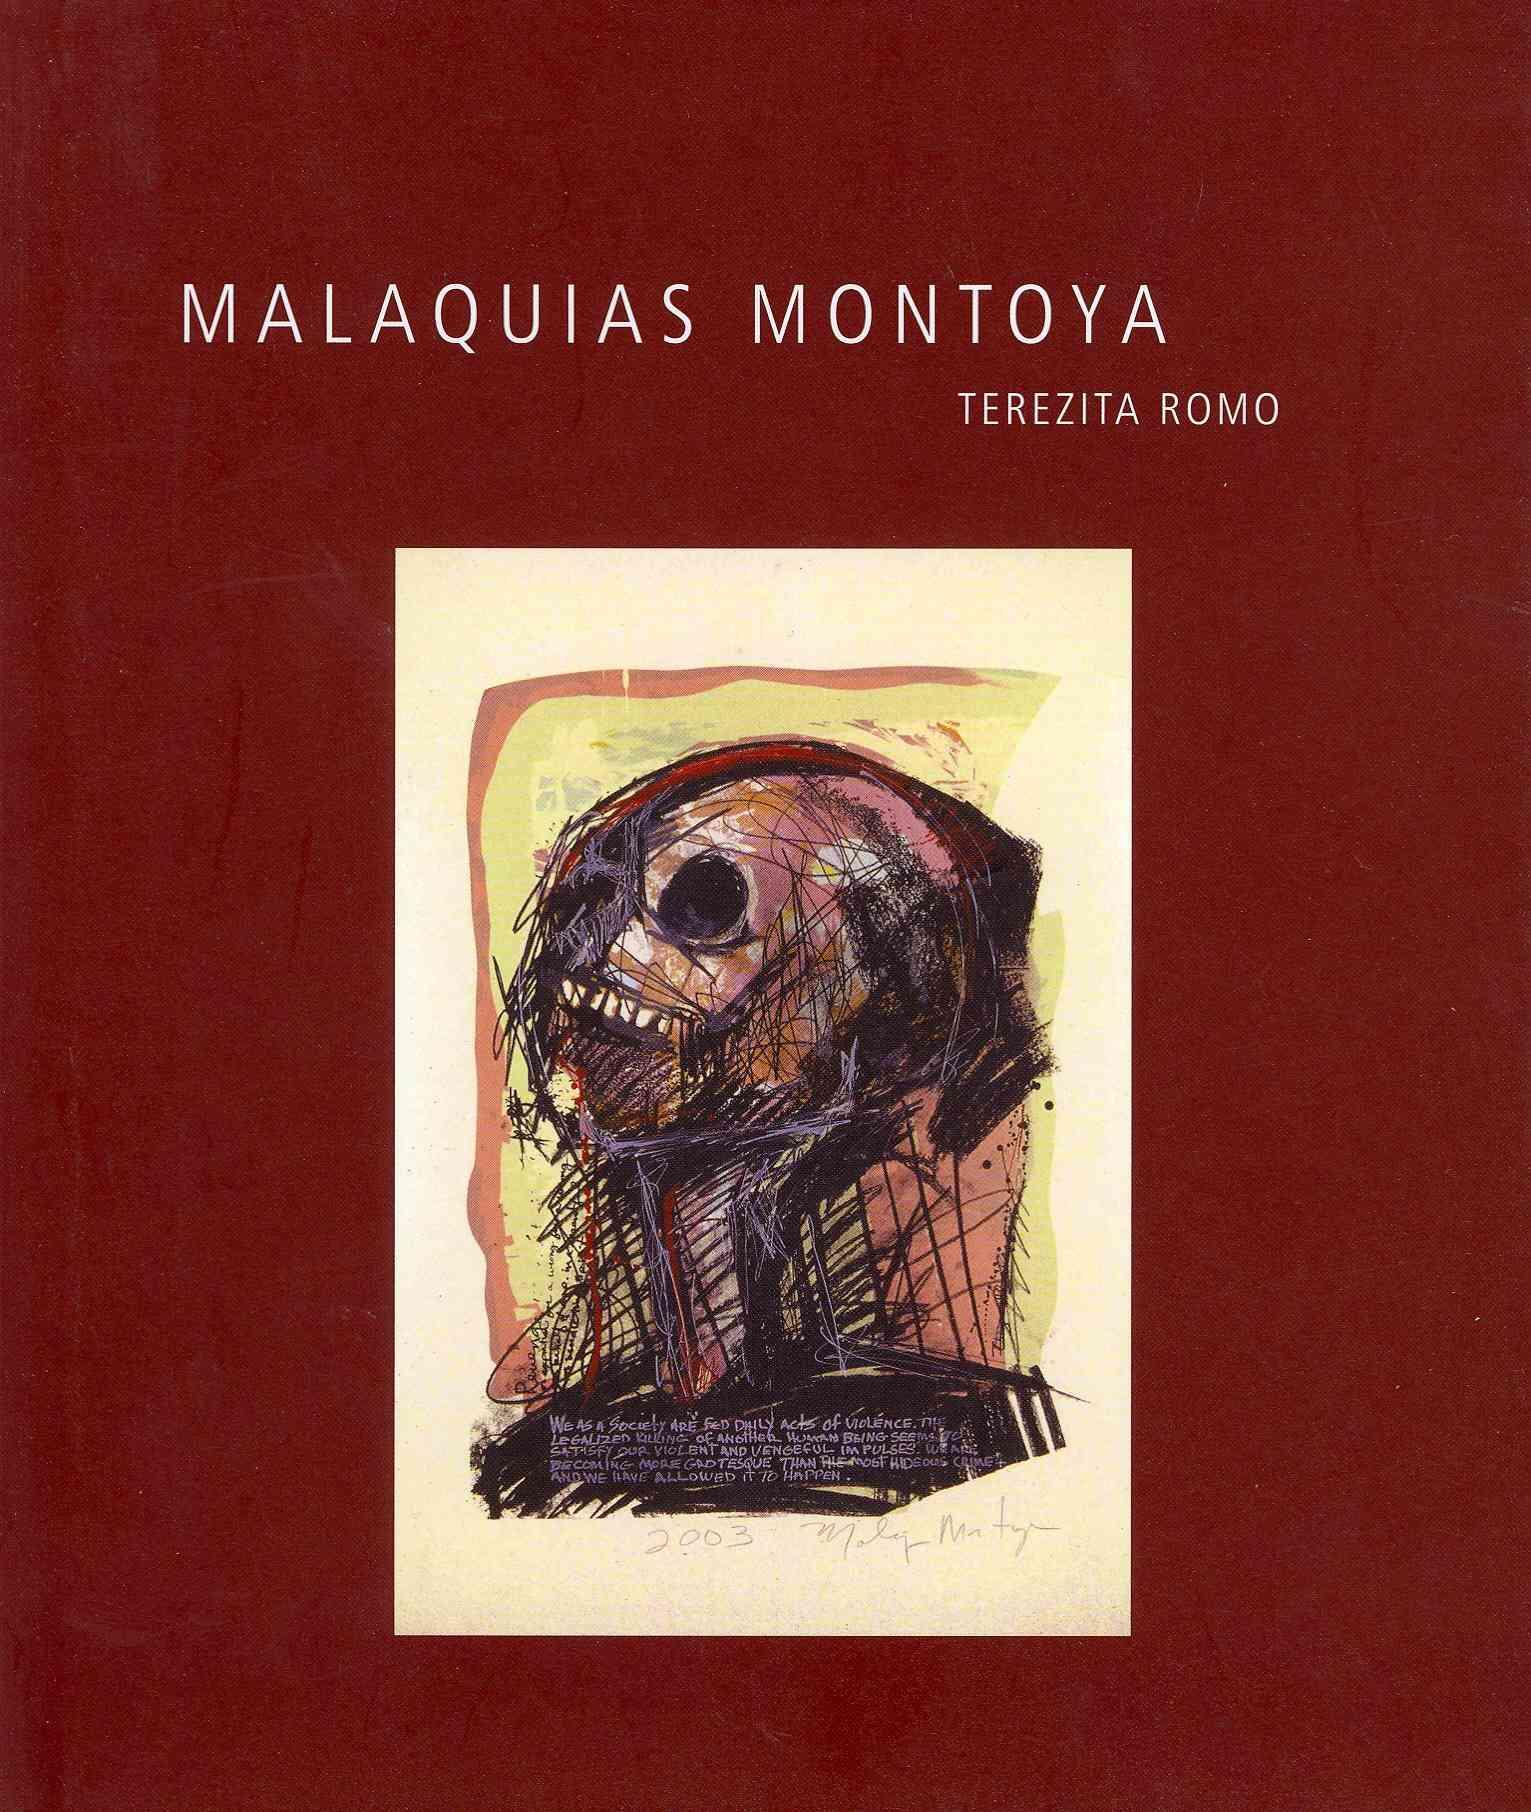 Malaquias Montoya By Romo, Terezita